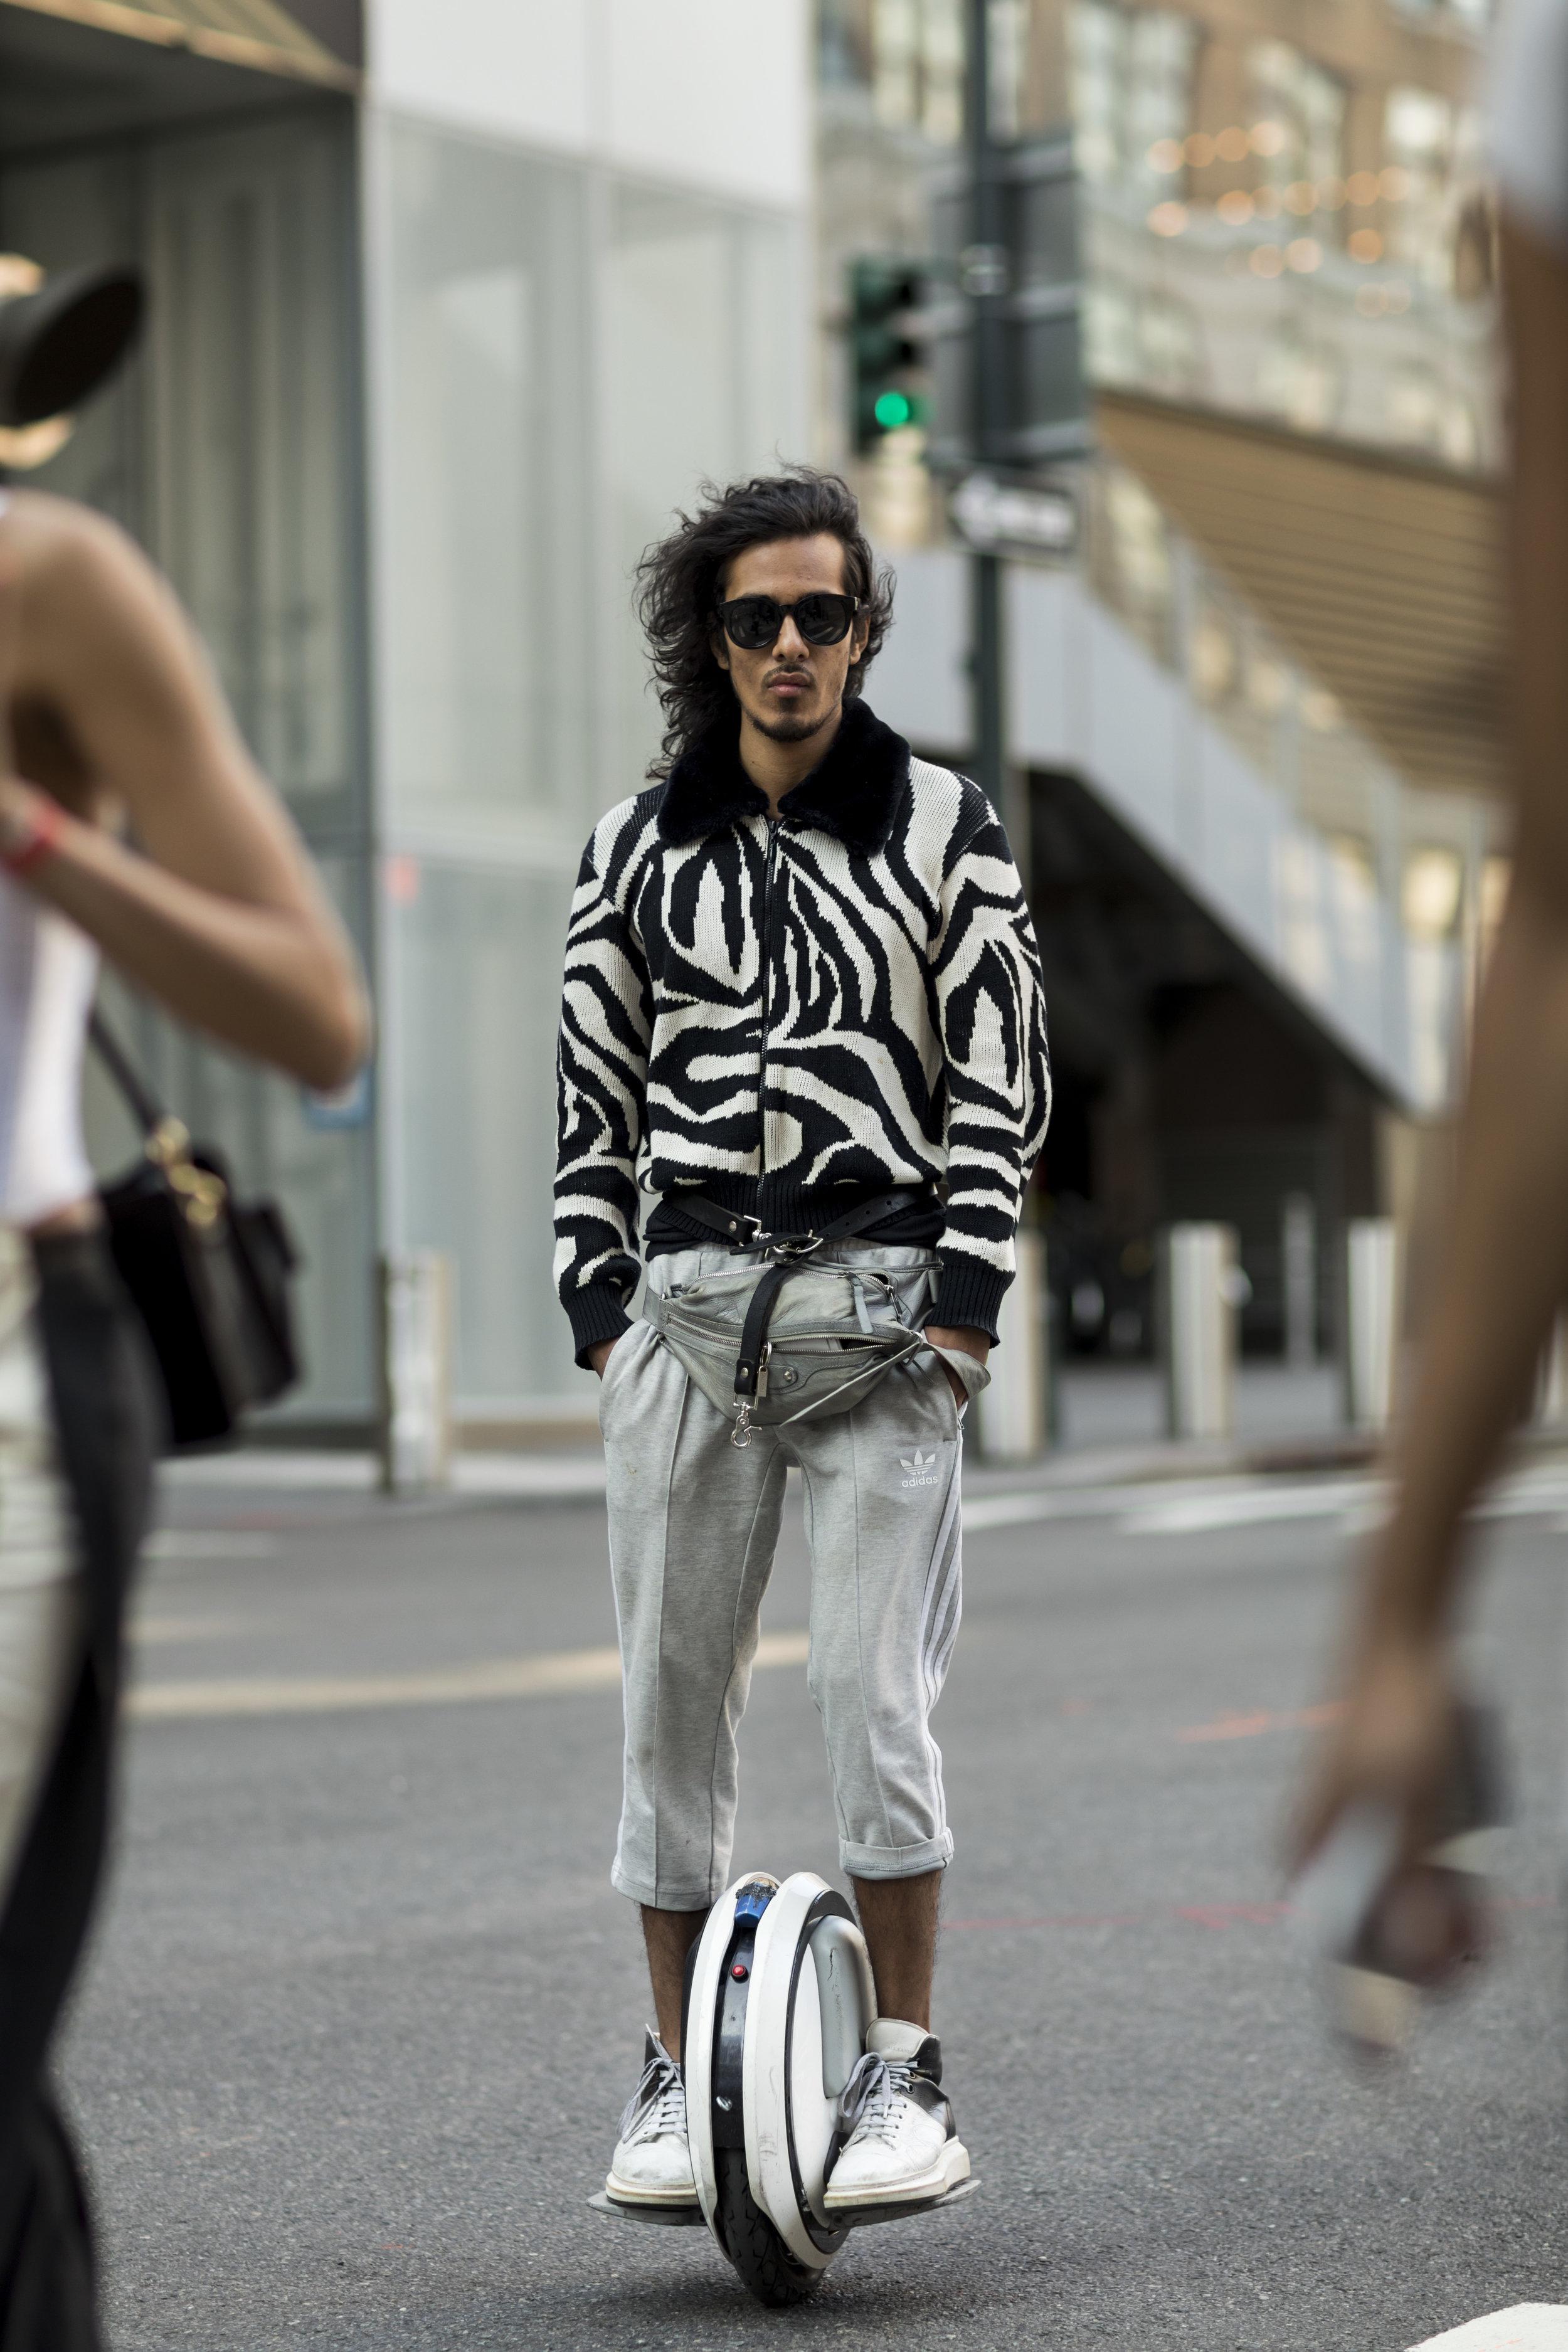 NYFW, NYFWM, NYMD, Mens, NYC, Street Style, Ashley Gallerani Photography